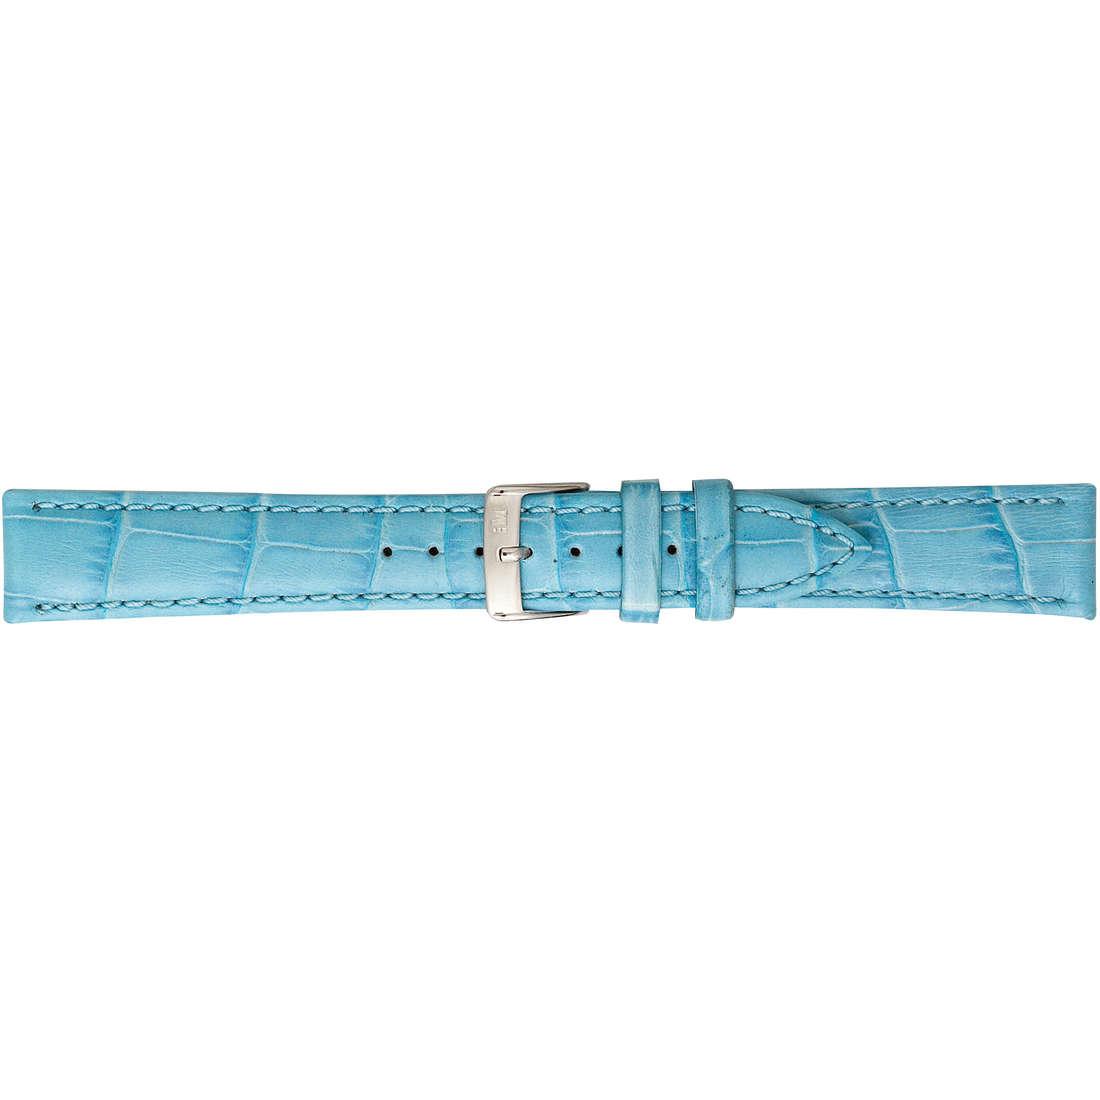 watch watch bands watch straps man Morellato Morellato 1930 A01X2269480168CR20